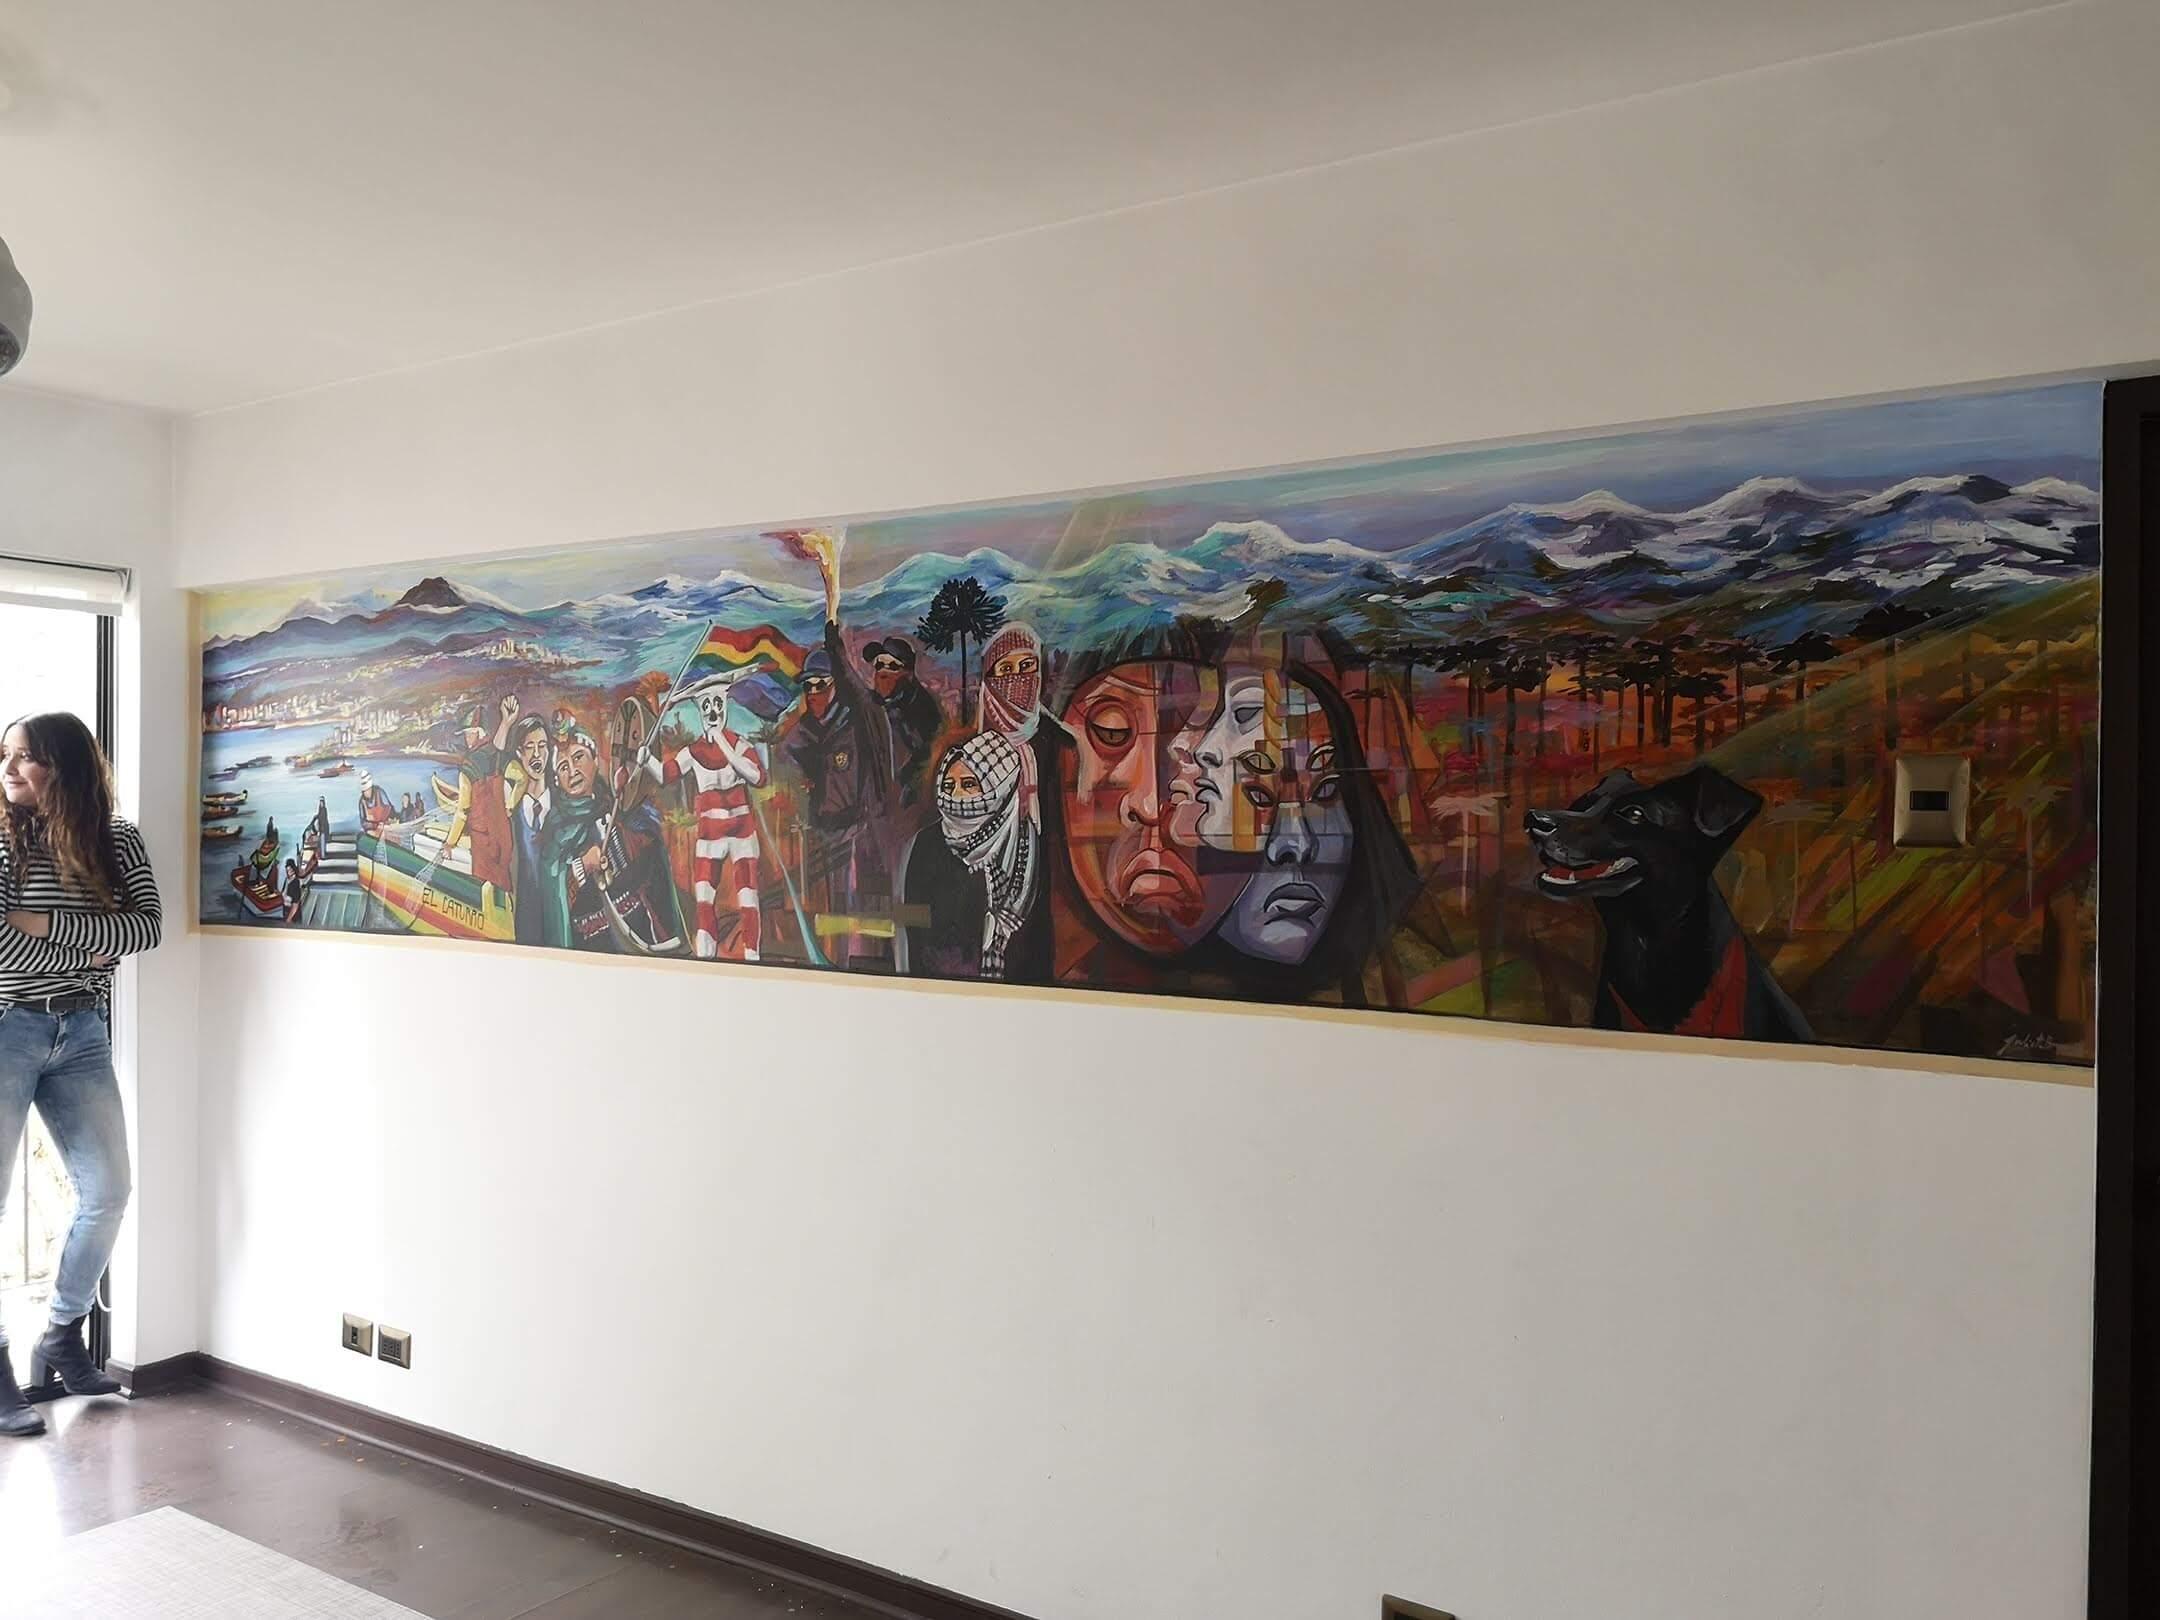 Mural encargo particular 2021